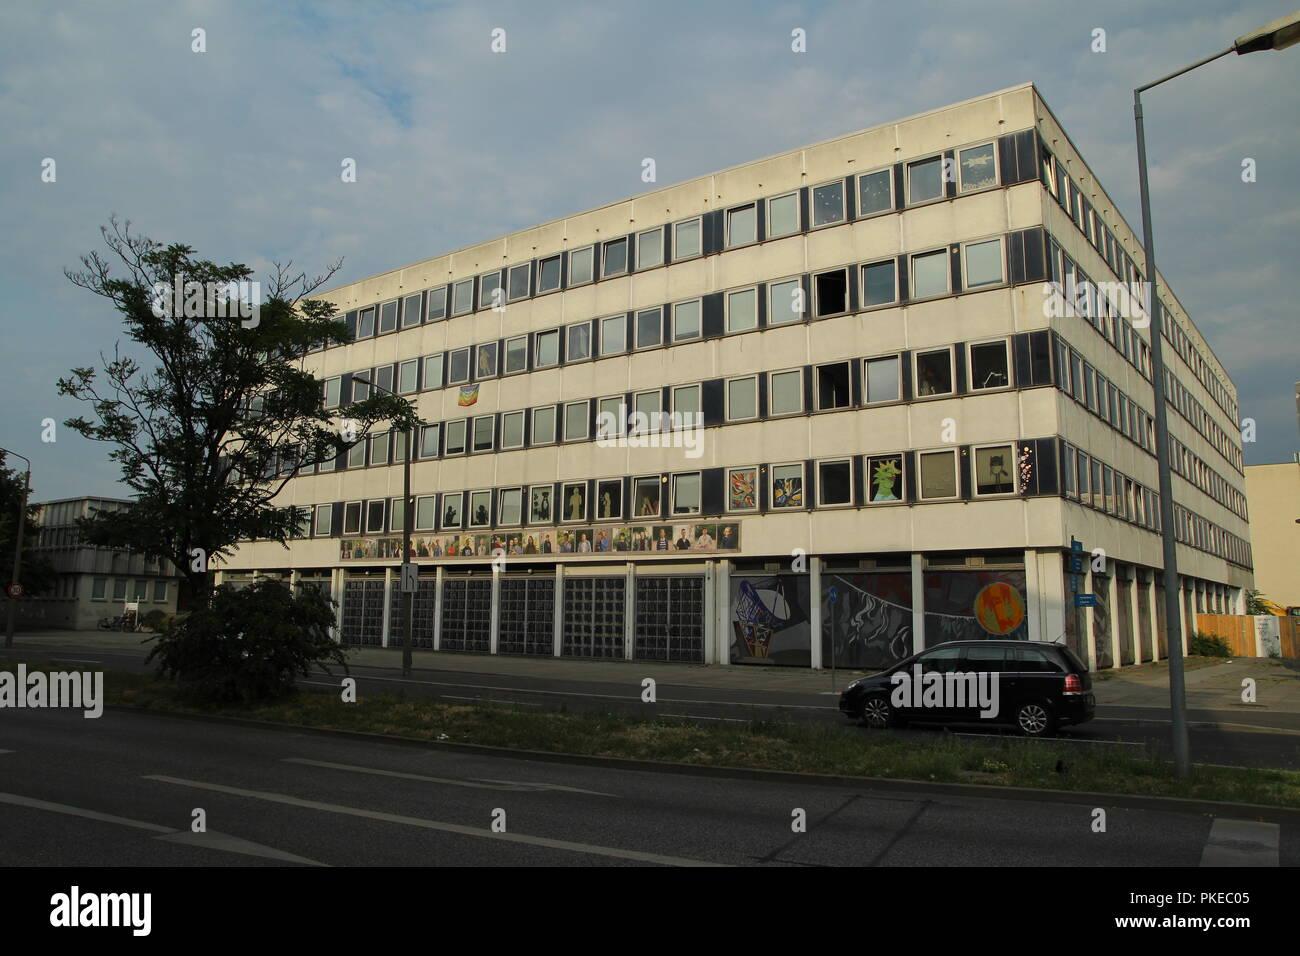 Socialist architecture in Potsdam,Germany. Stock Photo